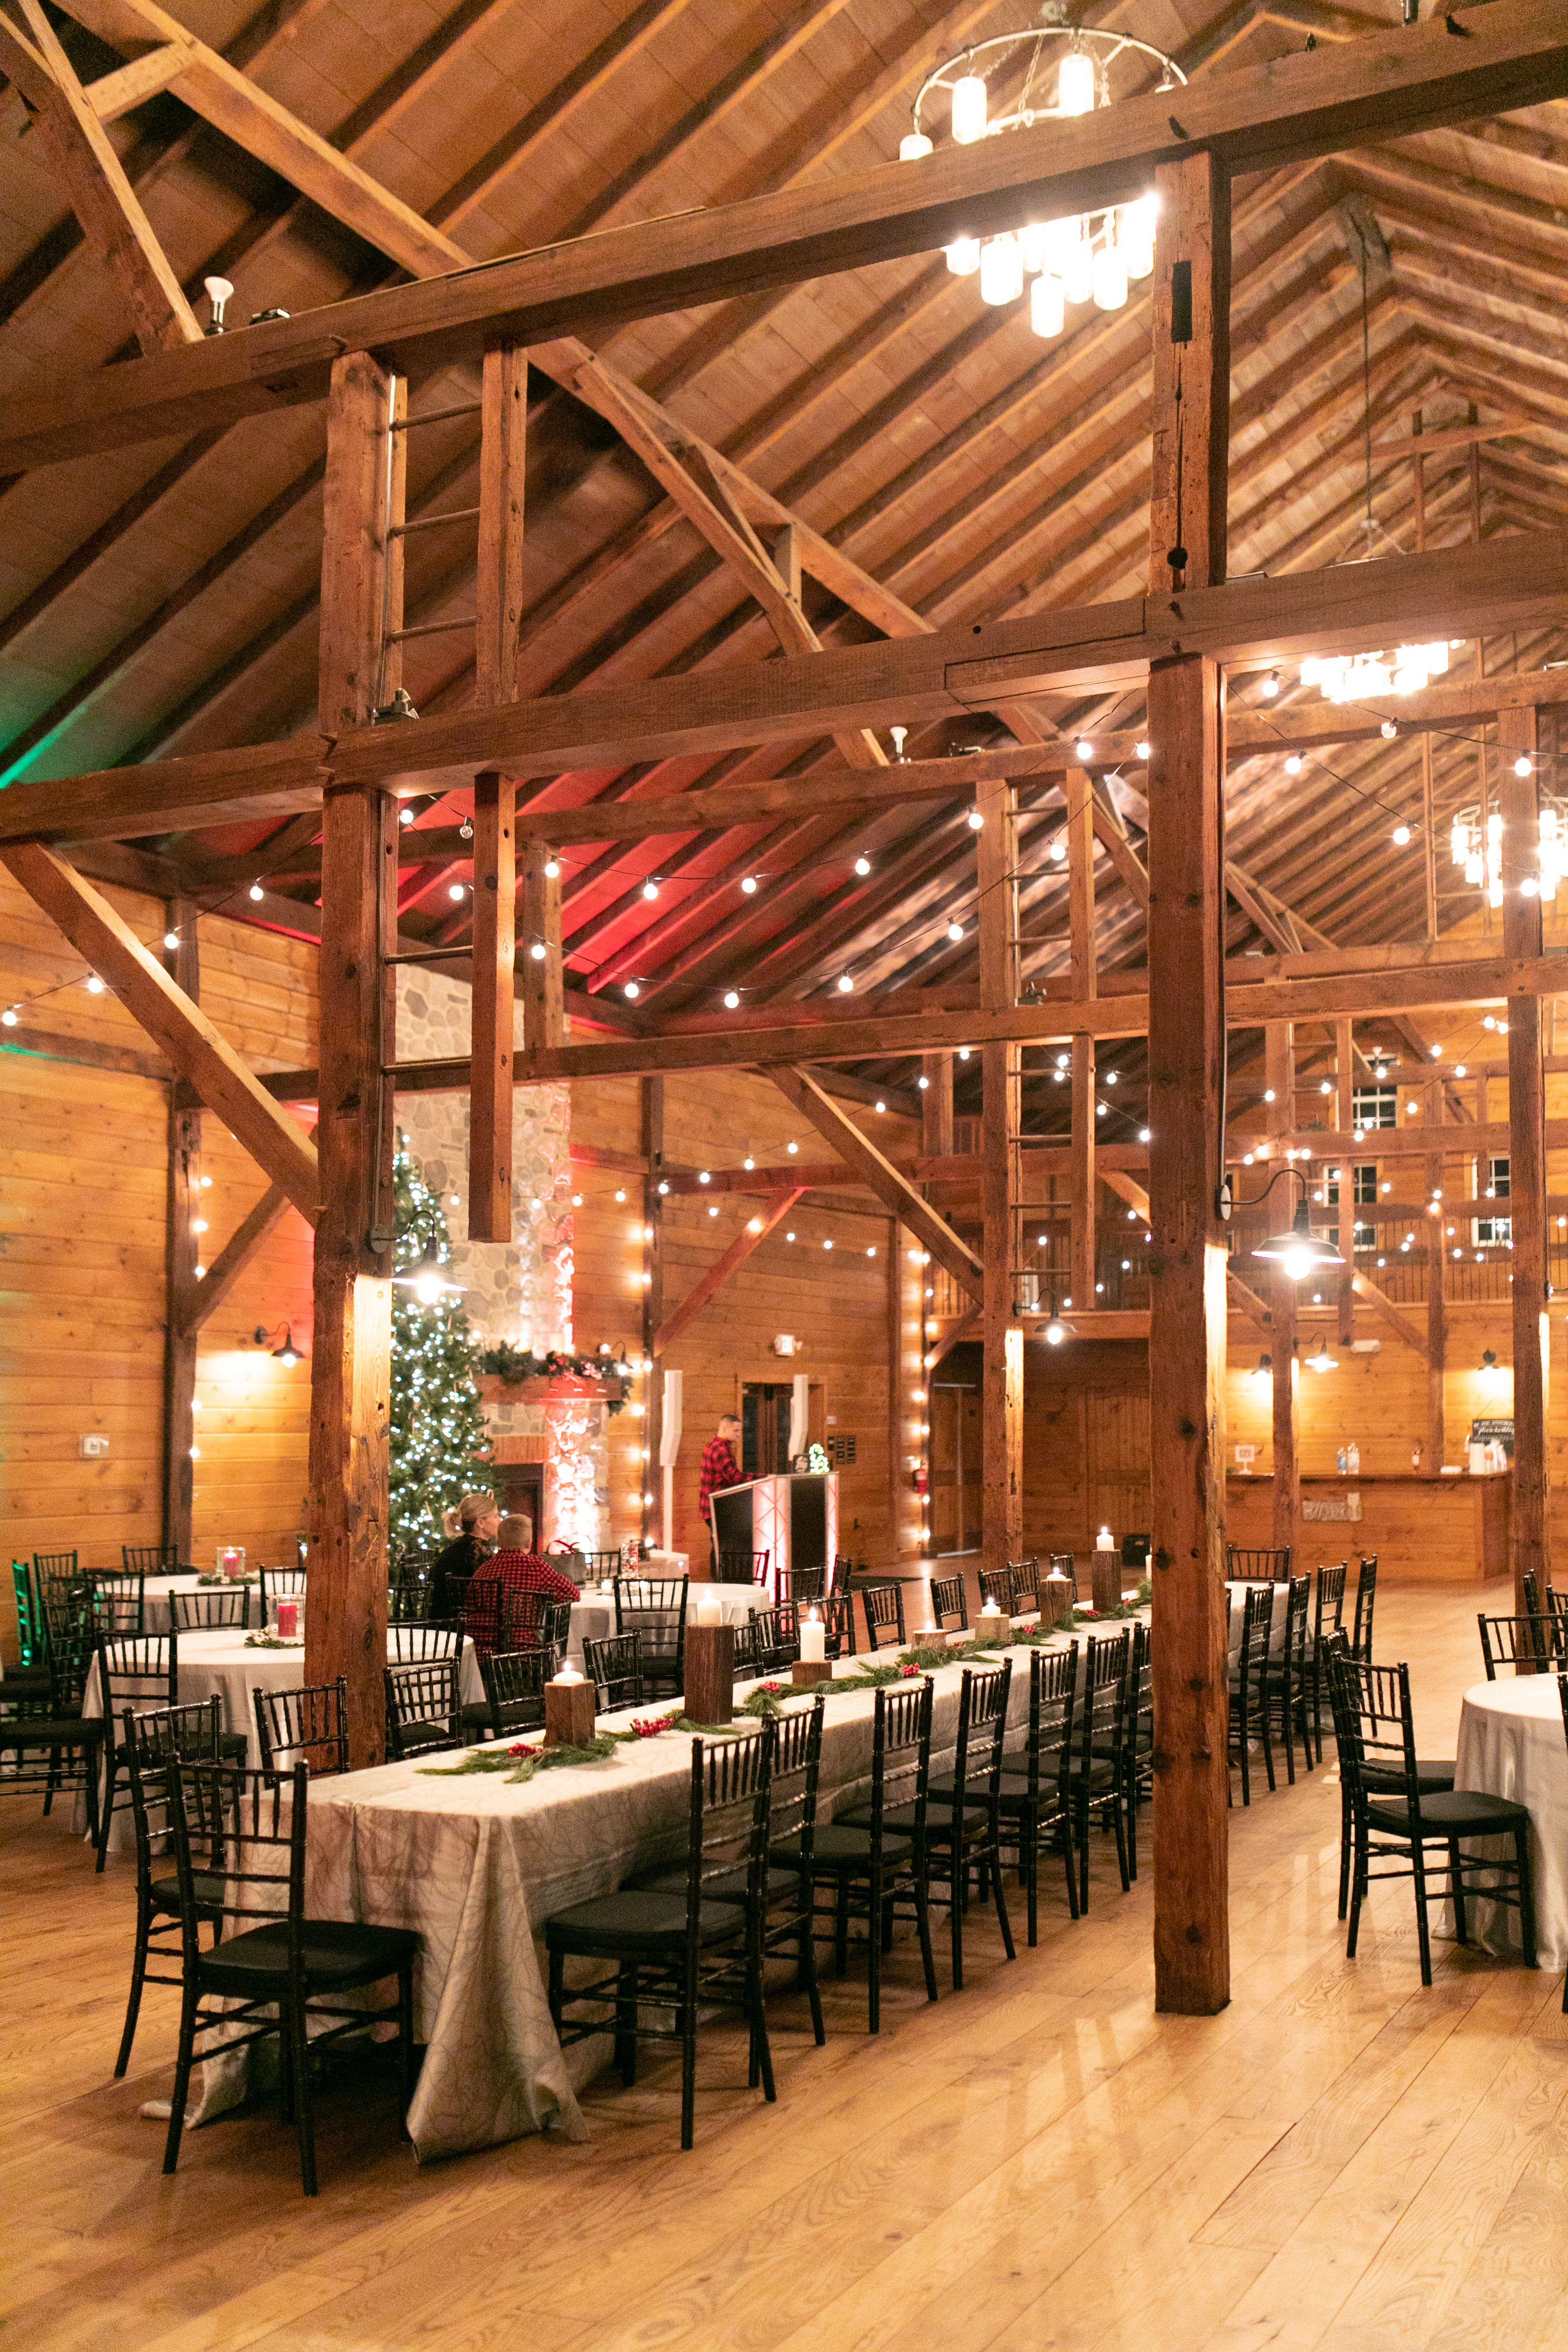 Barn Winter Wedding | Beautiful wedding venues, Winter ...